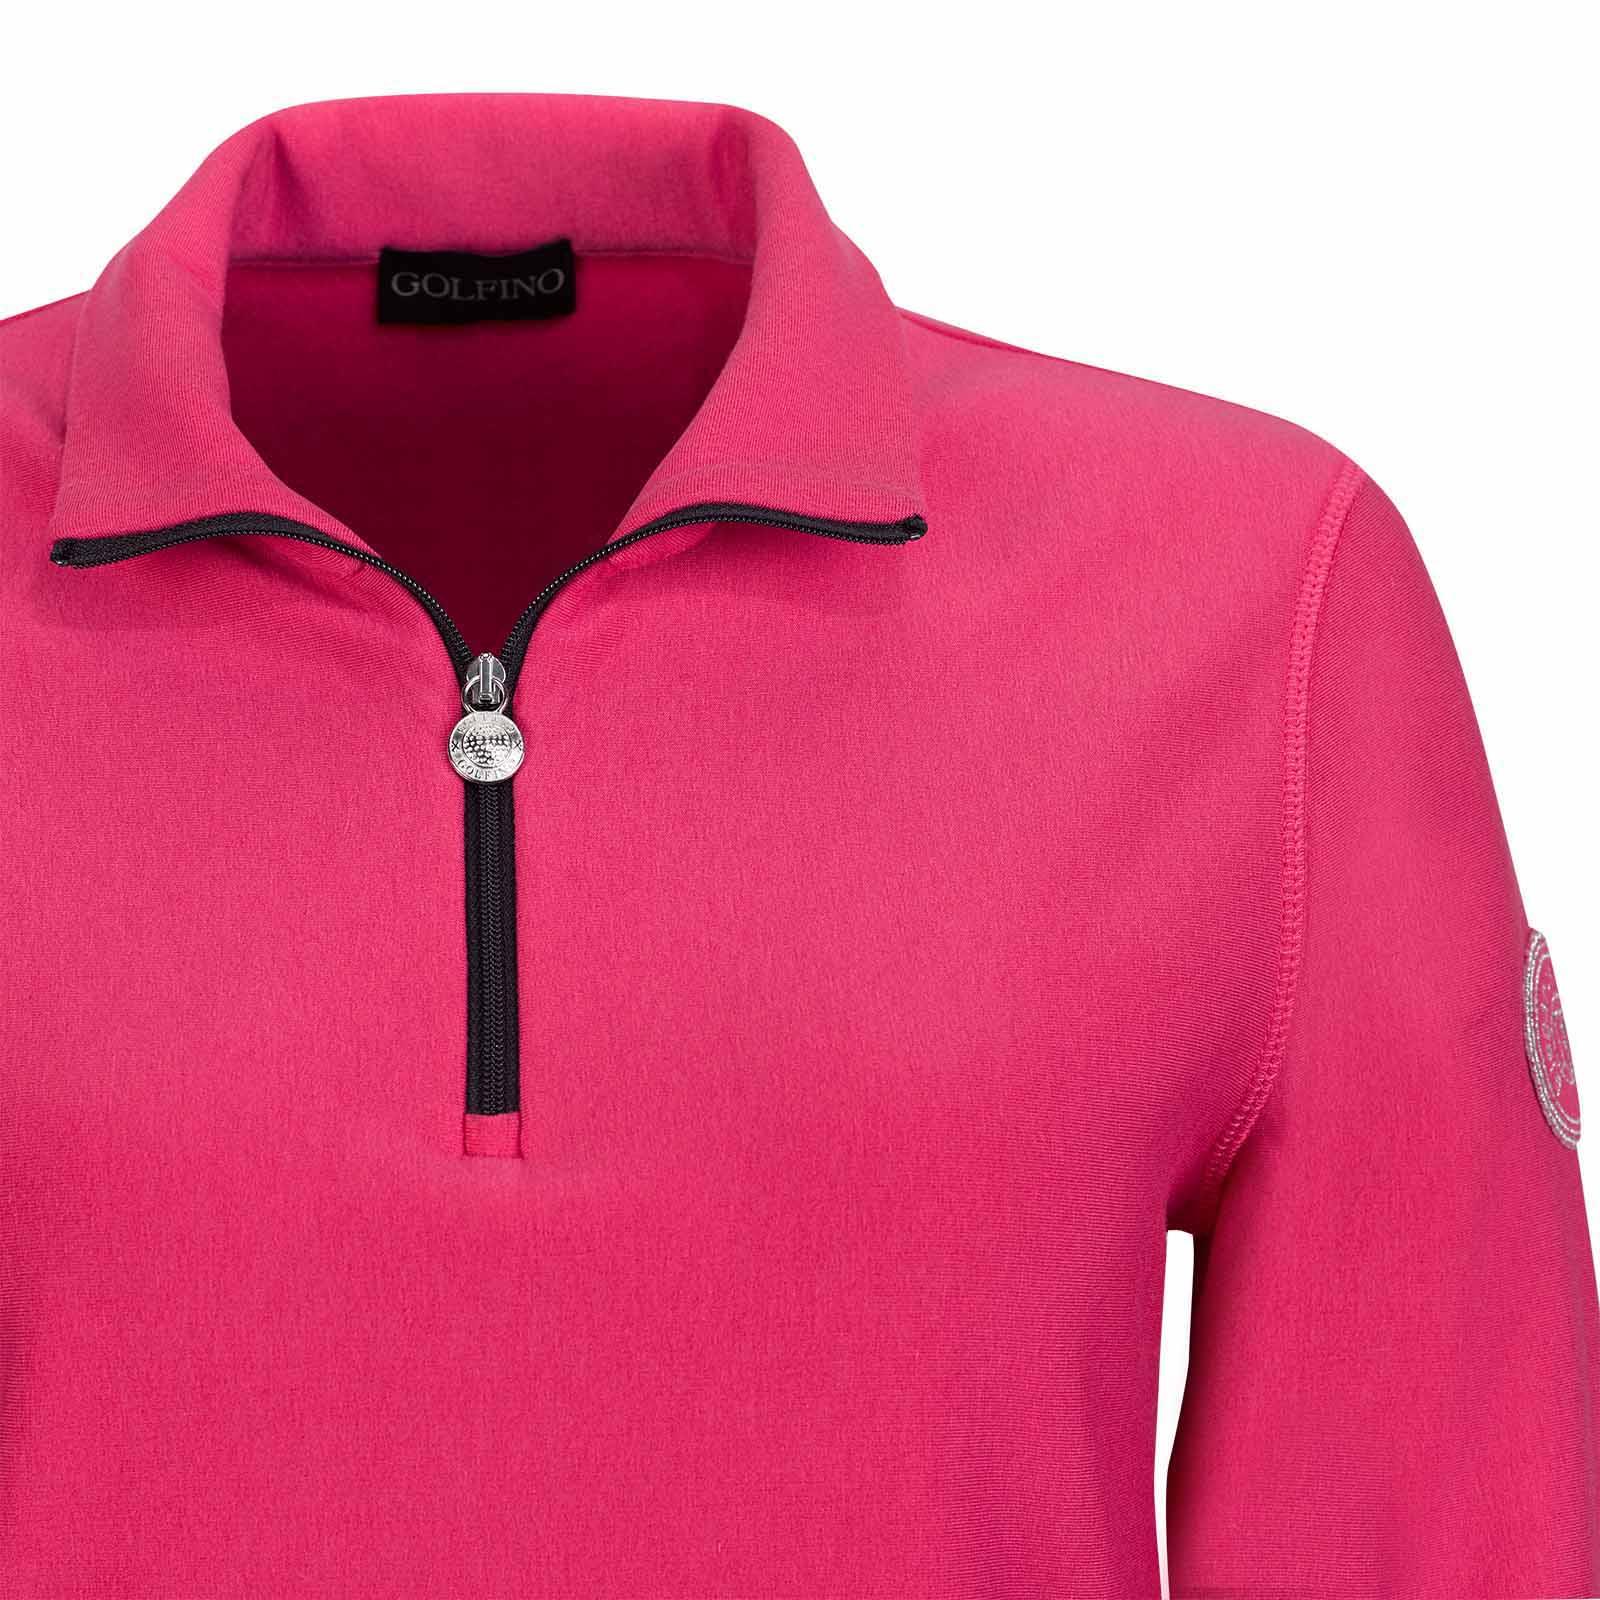 Damen Techno Wool Sweatshirt mit Cold Protection Funktion